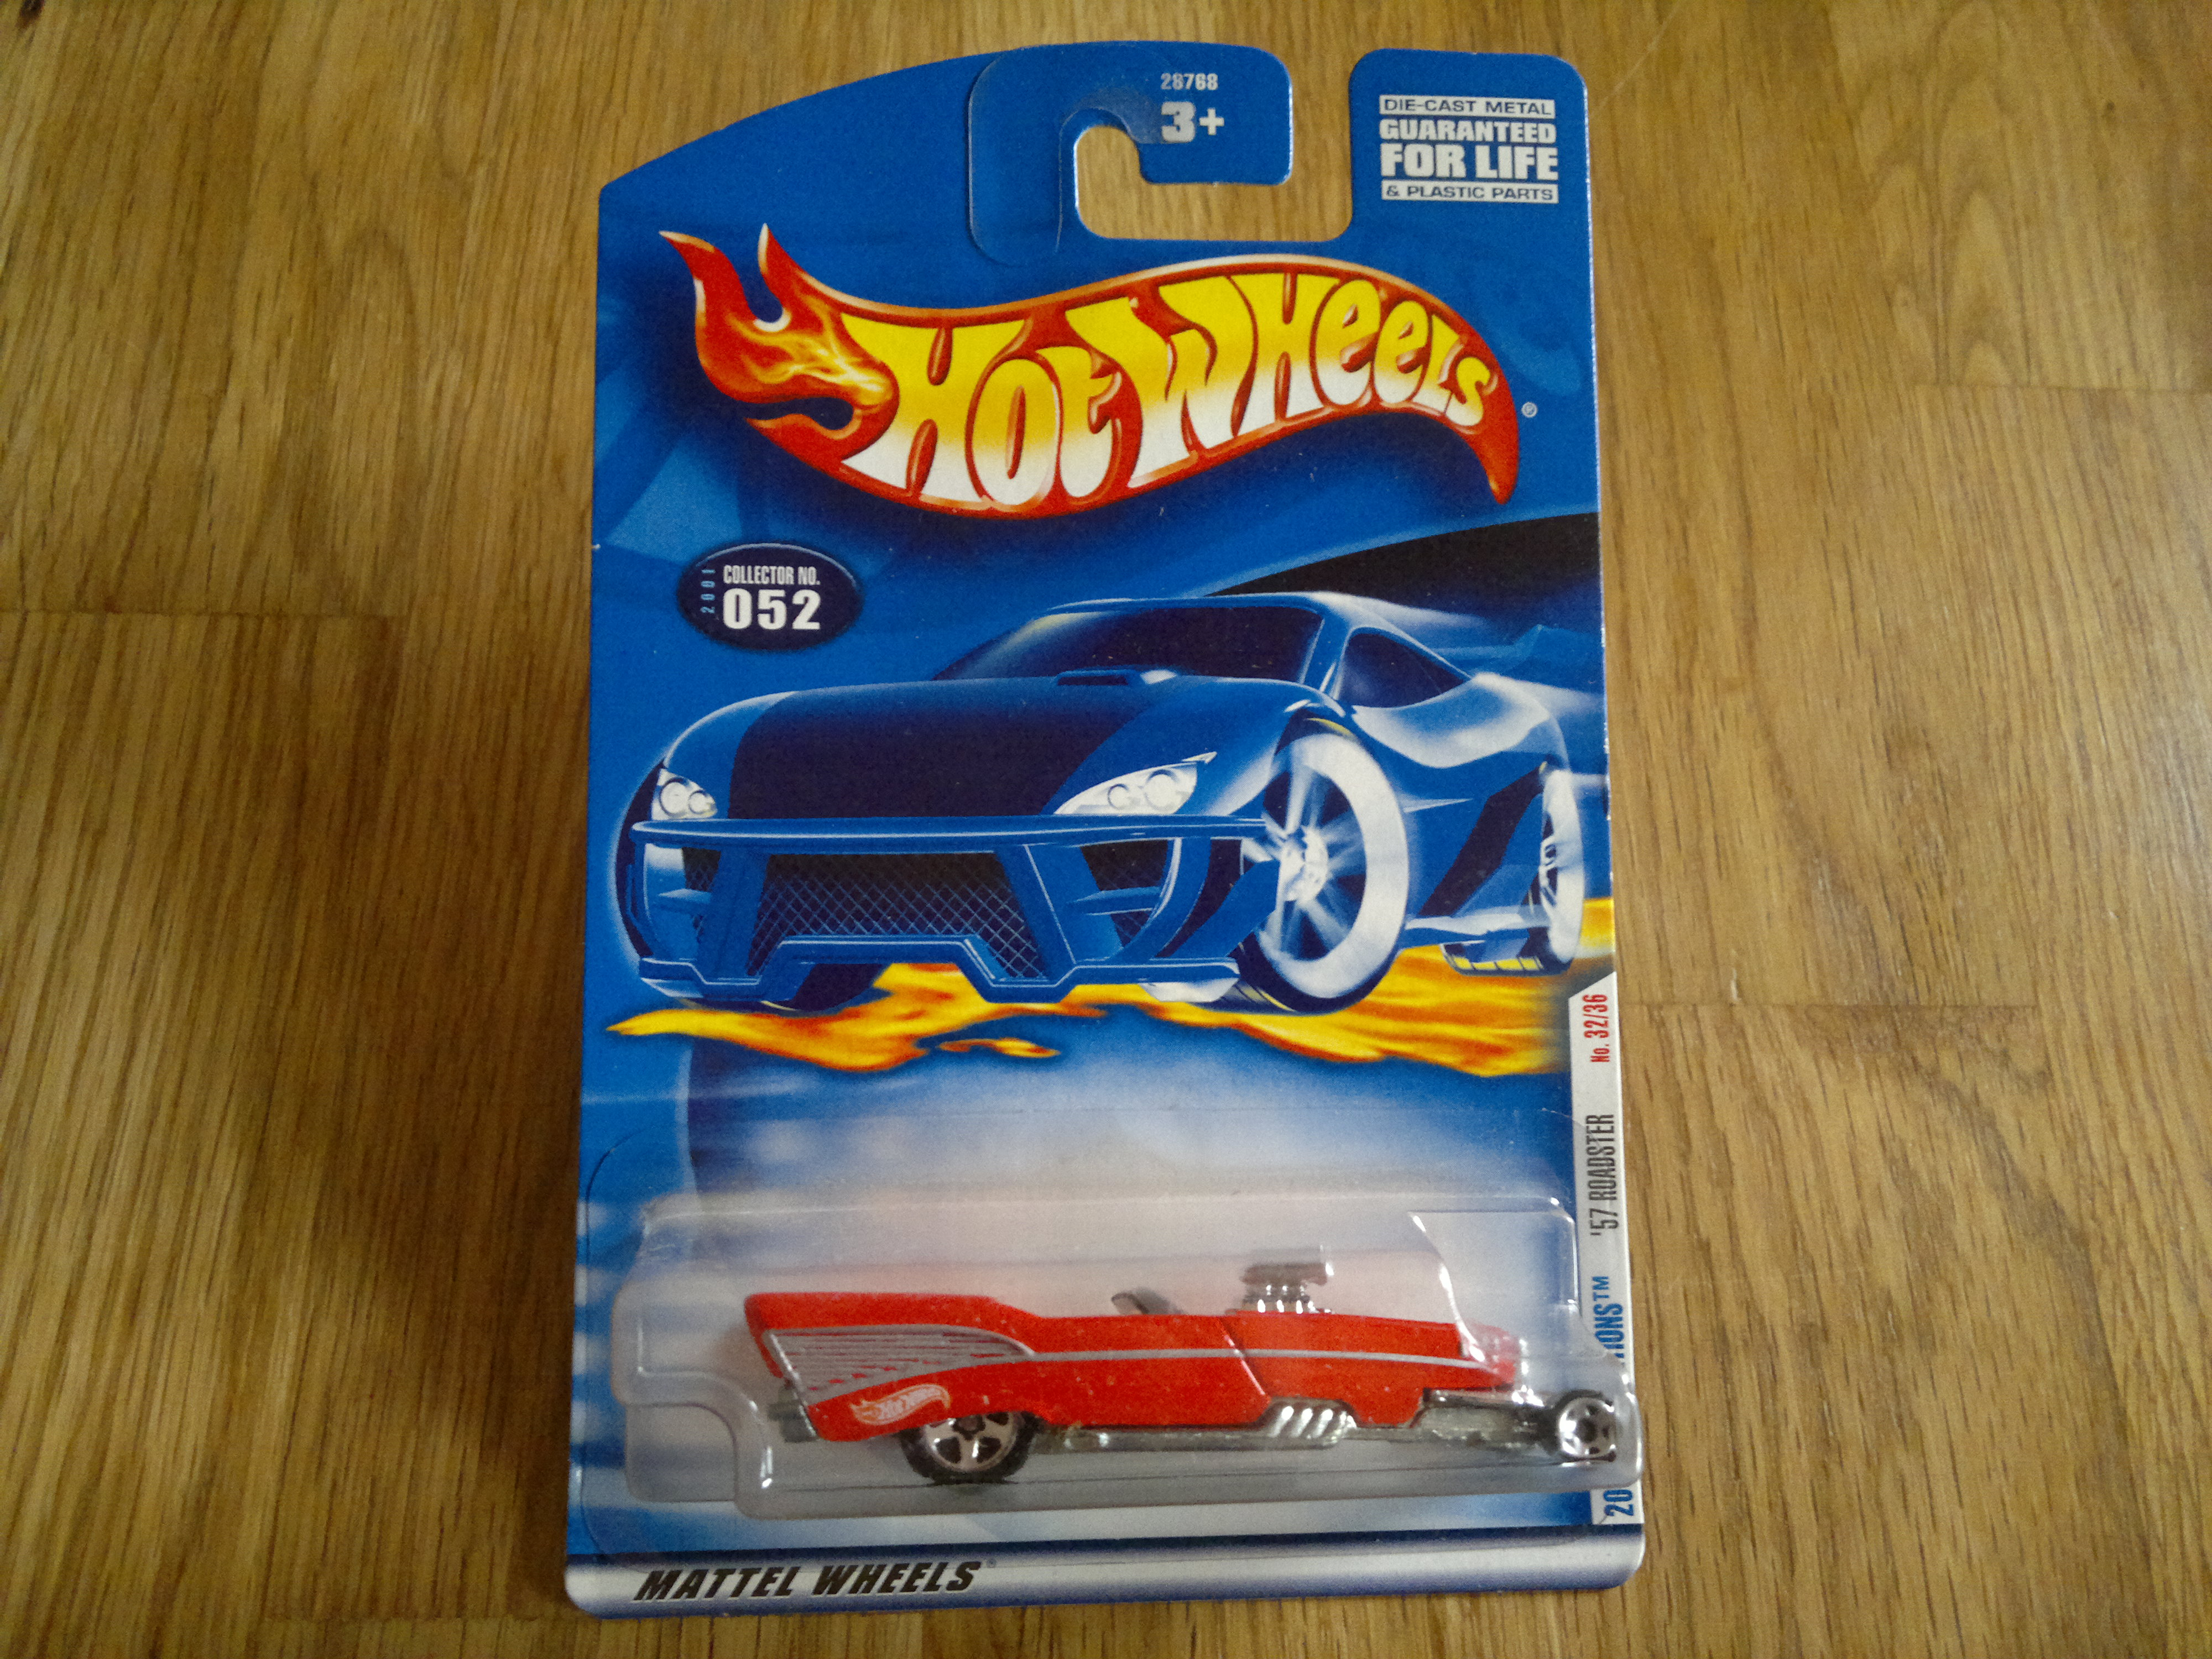 '57 Roadster